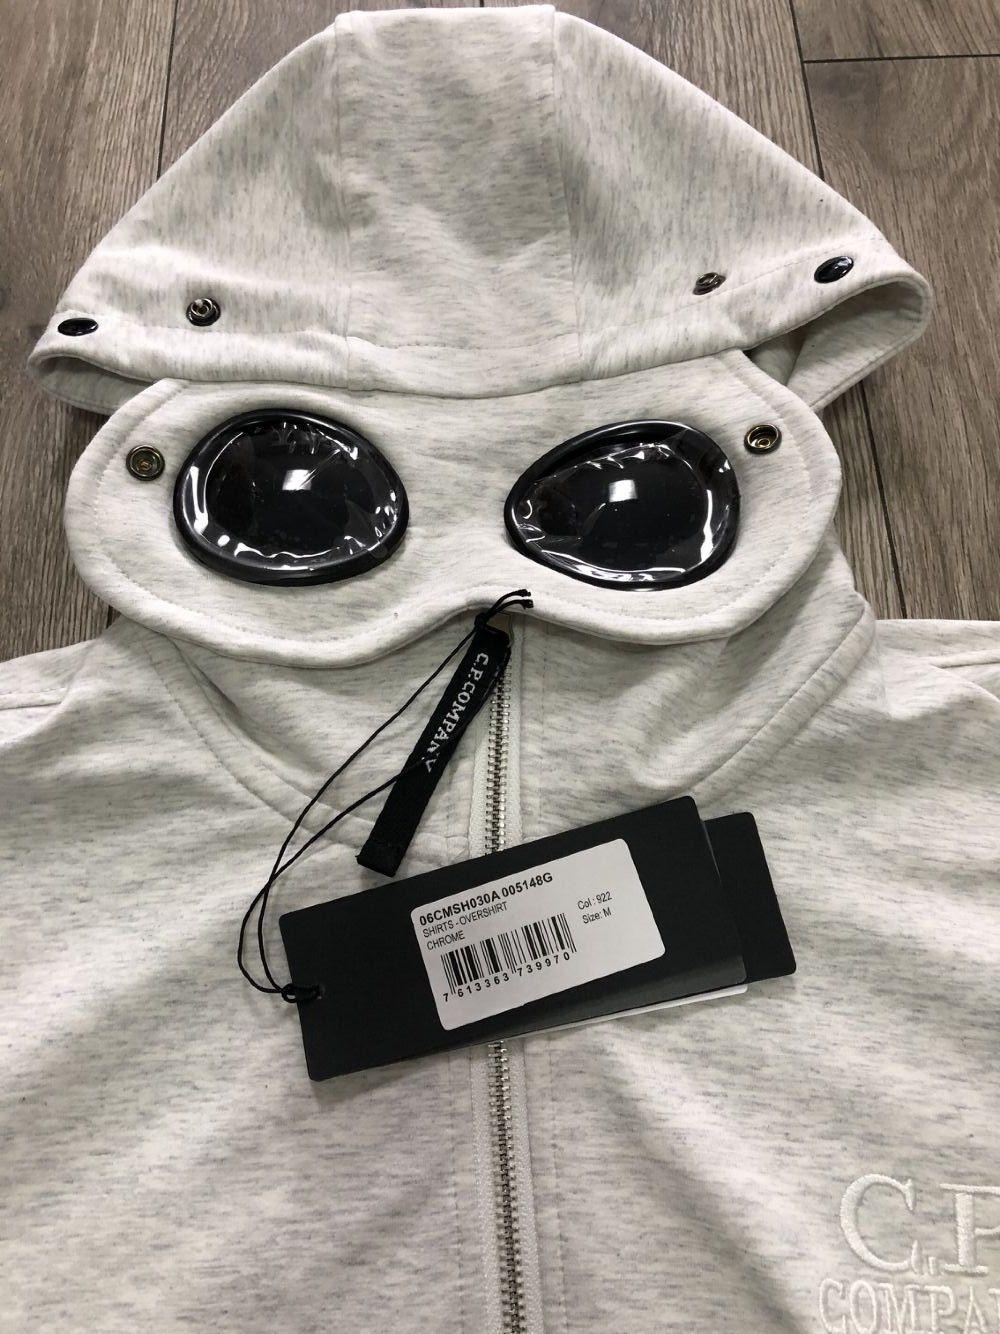 19SS CP 남성 재킷 브랜드 후드 지퍼 윈드 회사 디자이너 재킷 운동복 남성 명품 코트 선글라스 후드 캐주얼 B103433L